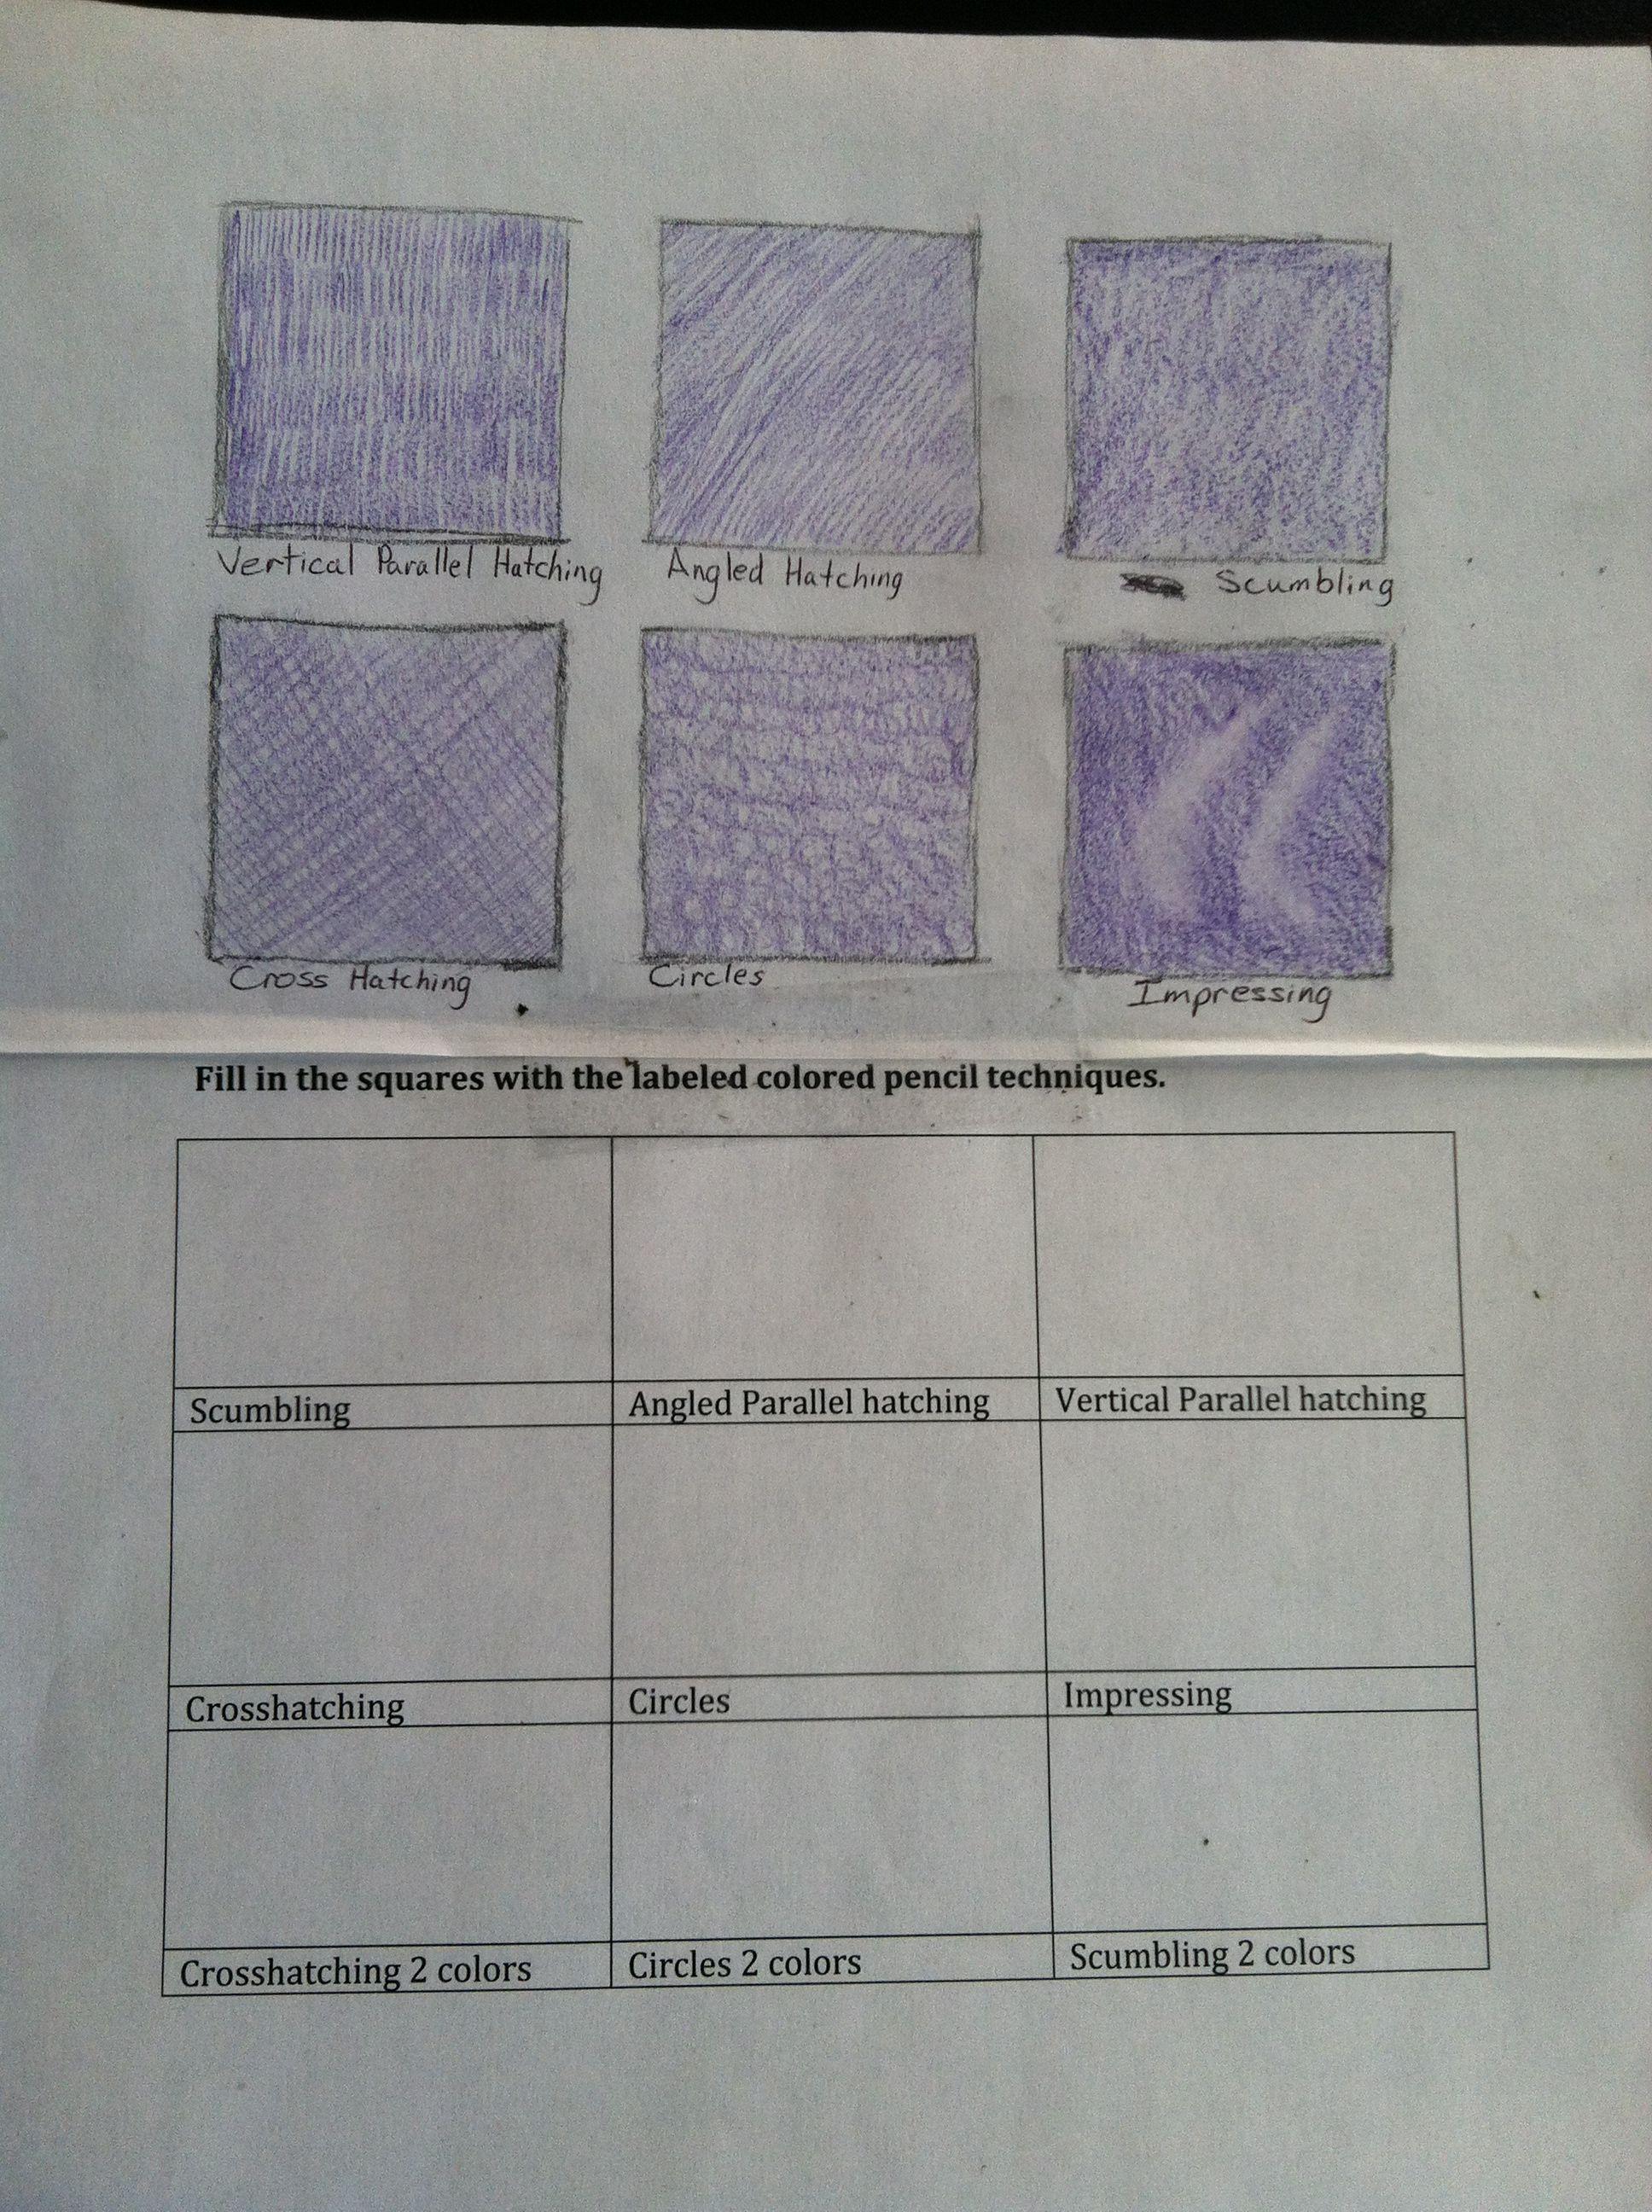 Colored Pencil Techniques